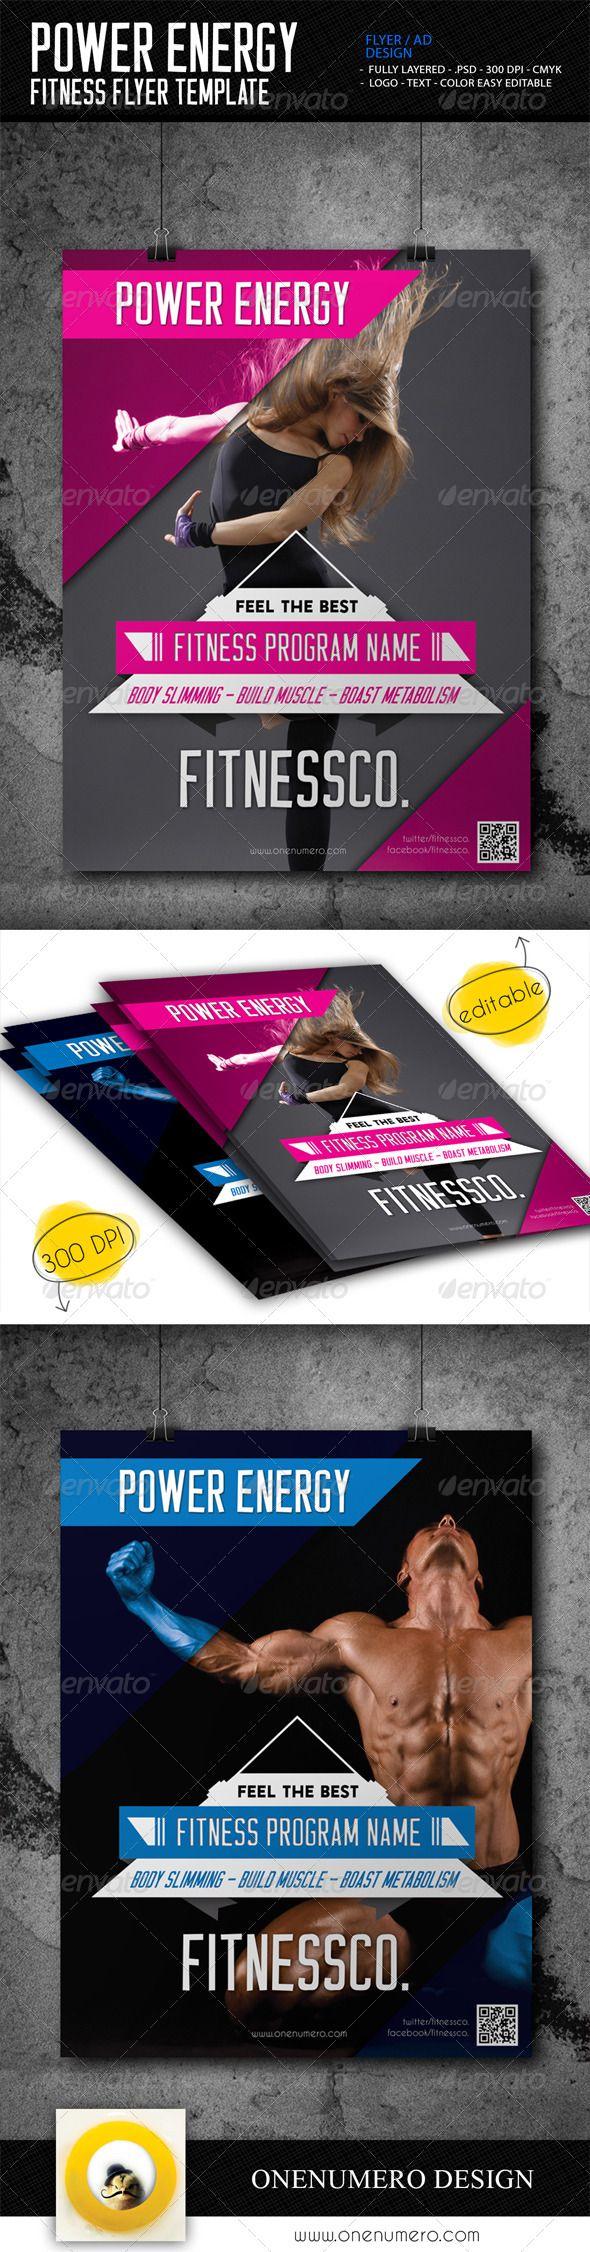 Power Energy Fitness Flyer Template - Sports Events Maybe buy it http://graphicriver.net/item/power-energy-fitness-flyer-template/7662781?WT.ac=portfolio&WT.seg_1=portfolio&WT.z_author=onenumero